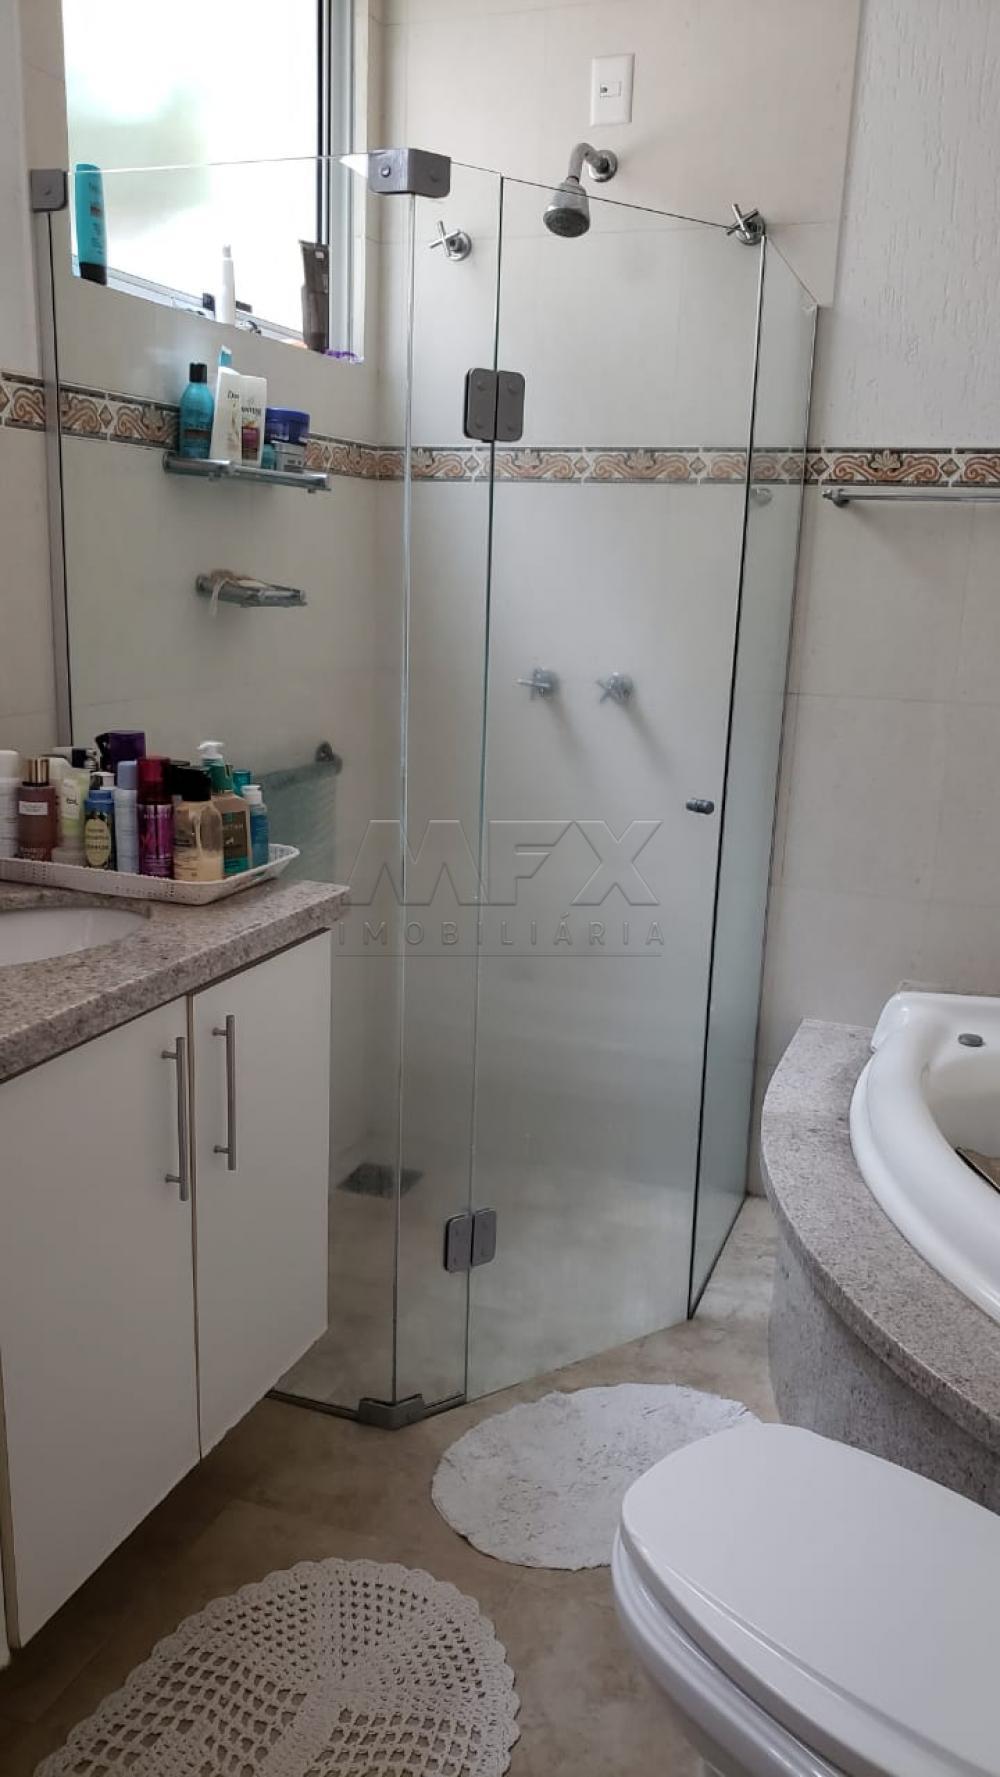 Comprar Casa / Condomínio em Bauru apenas R$ 990.000,00 - Foto 11